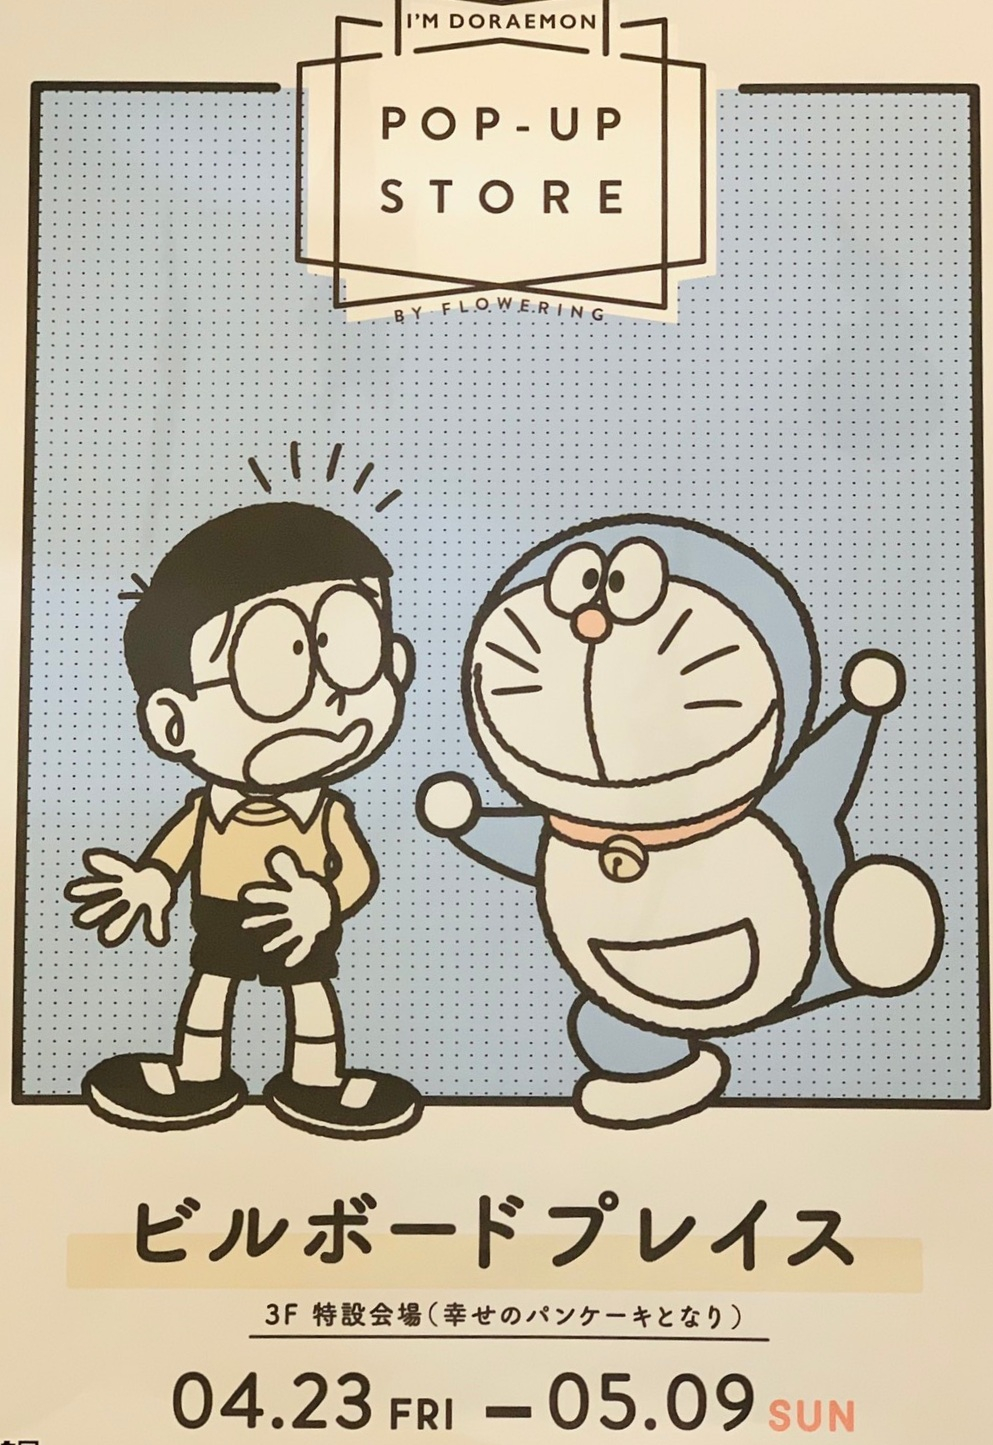 I'm Doraemon POP-UP STORE 終了間近!